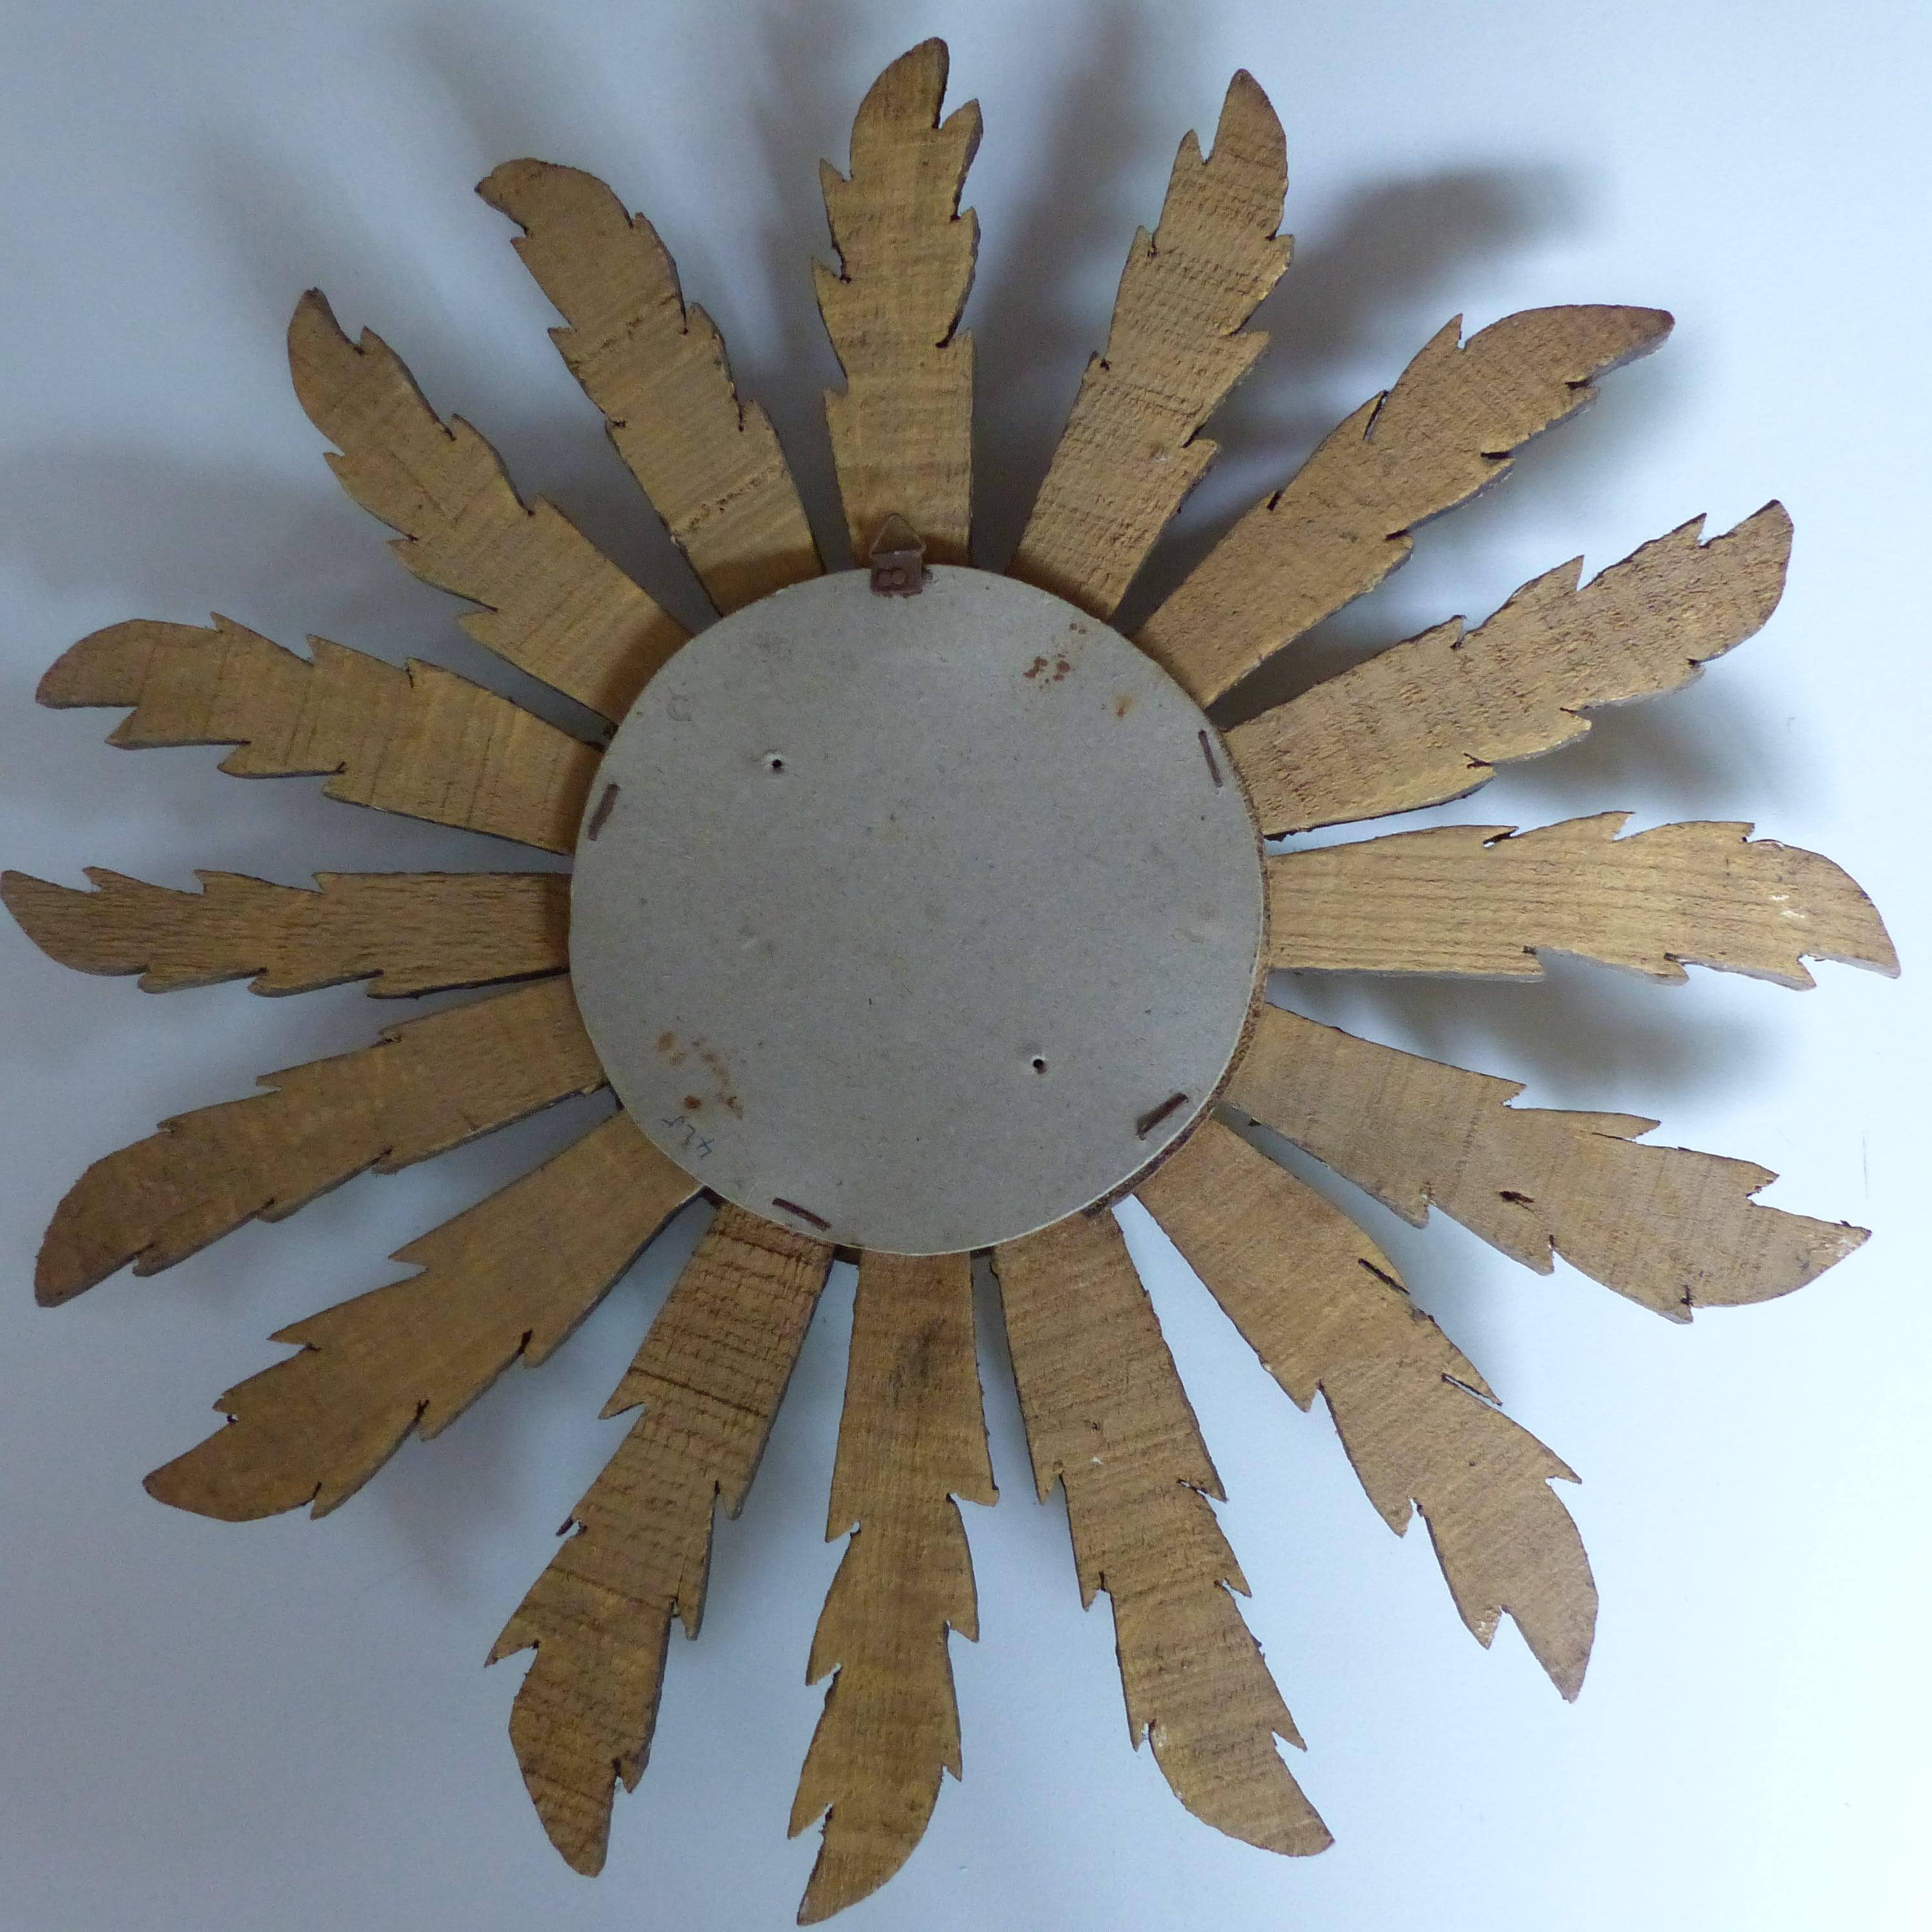 Miroir soleil en bois dor lignedebrocante brocante en for Miroir soleil bois